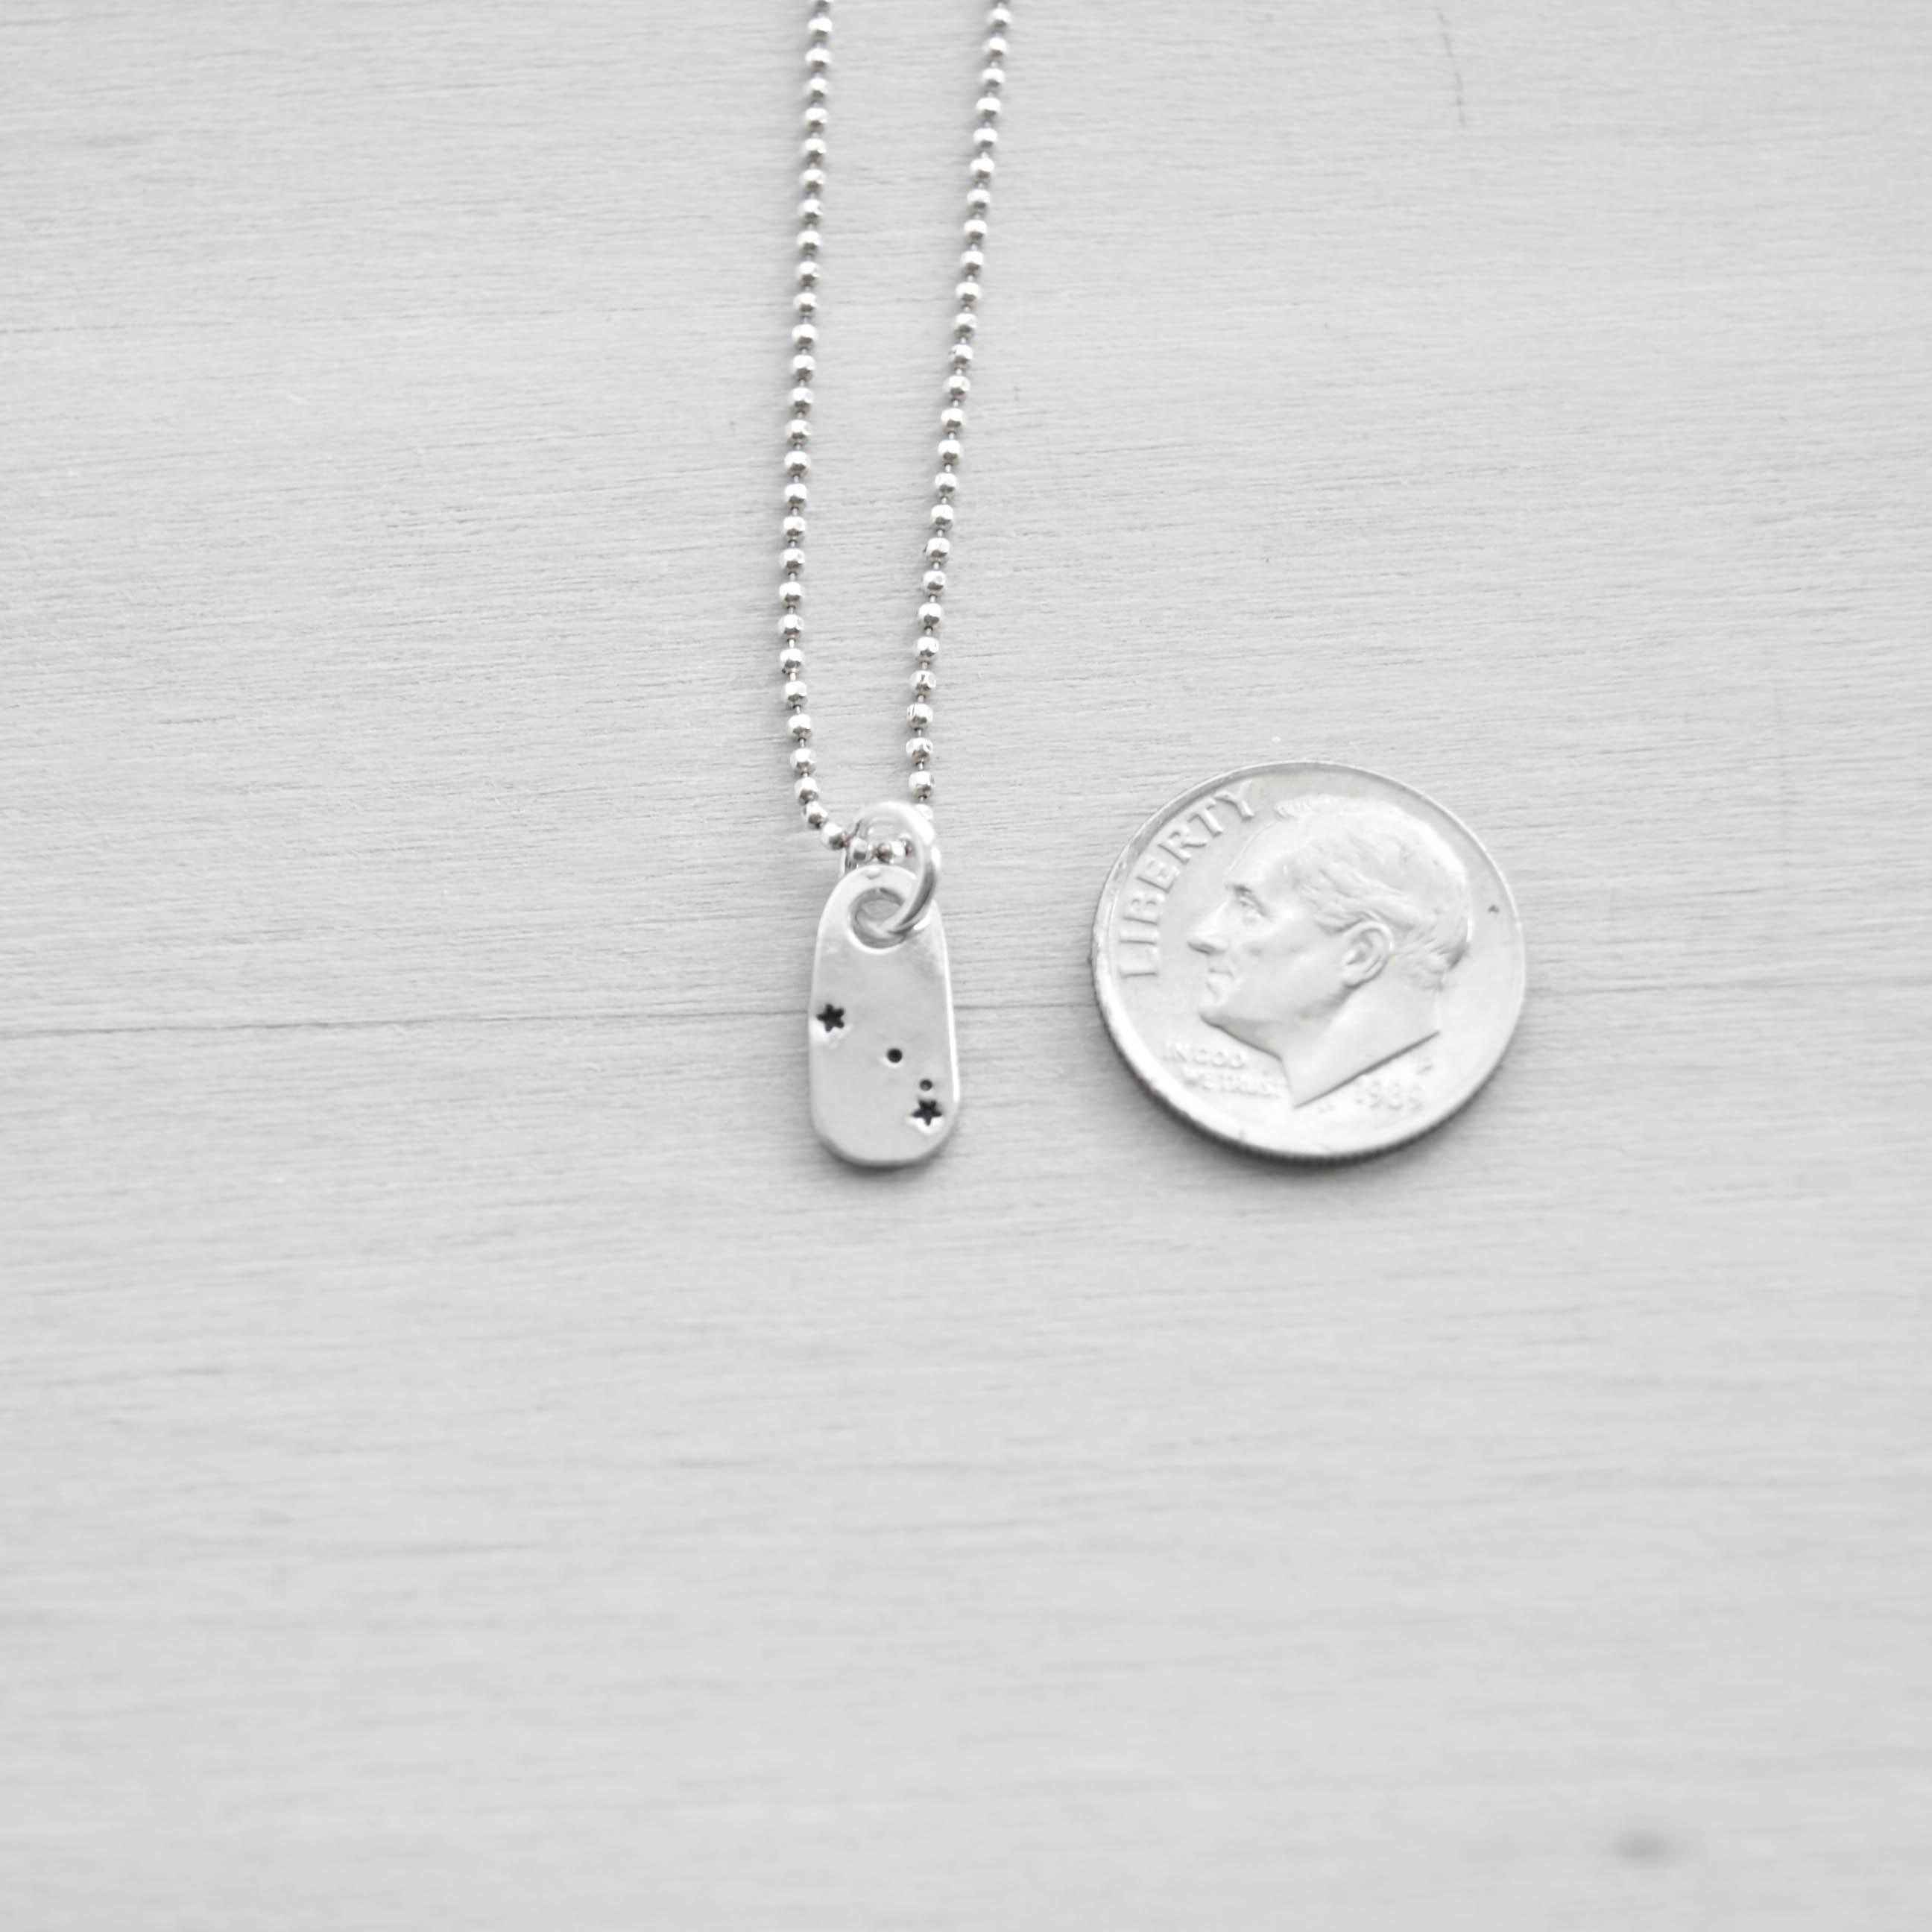 Aries Constellation Zodiac Necklace